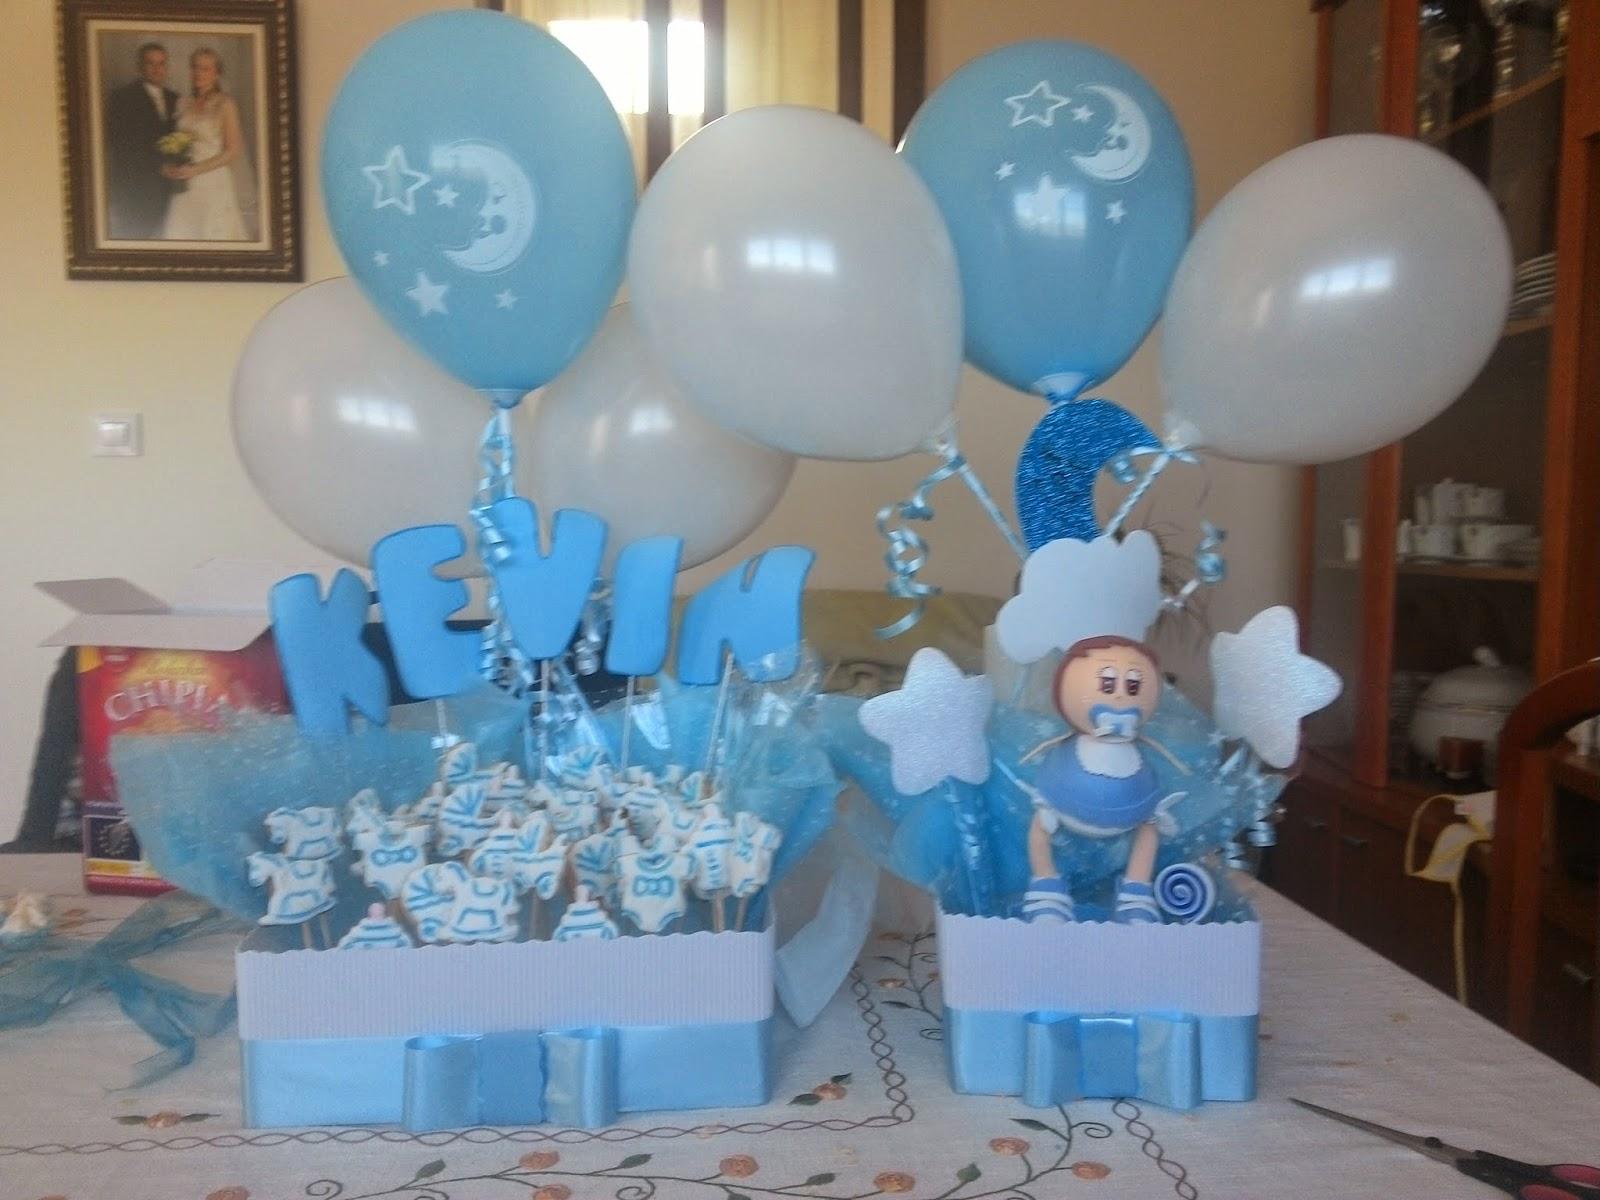 Creaciones naxi centro de mesa con globos for Decoracion de bautizo